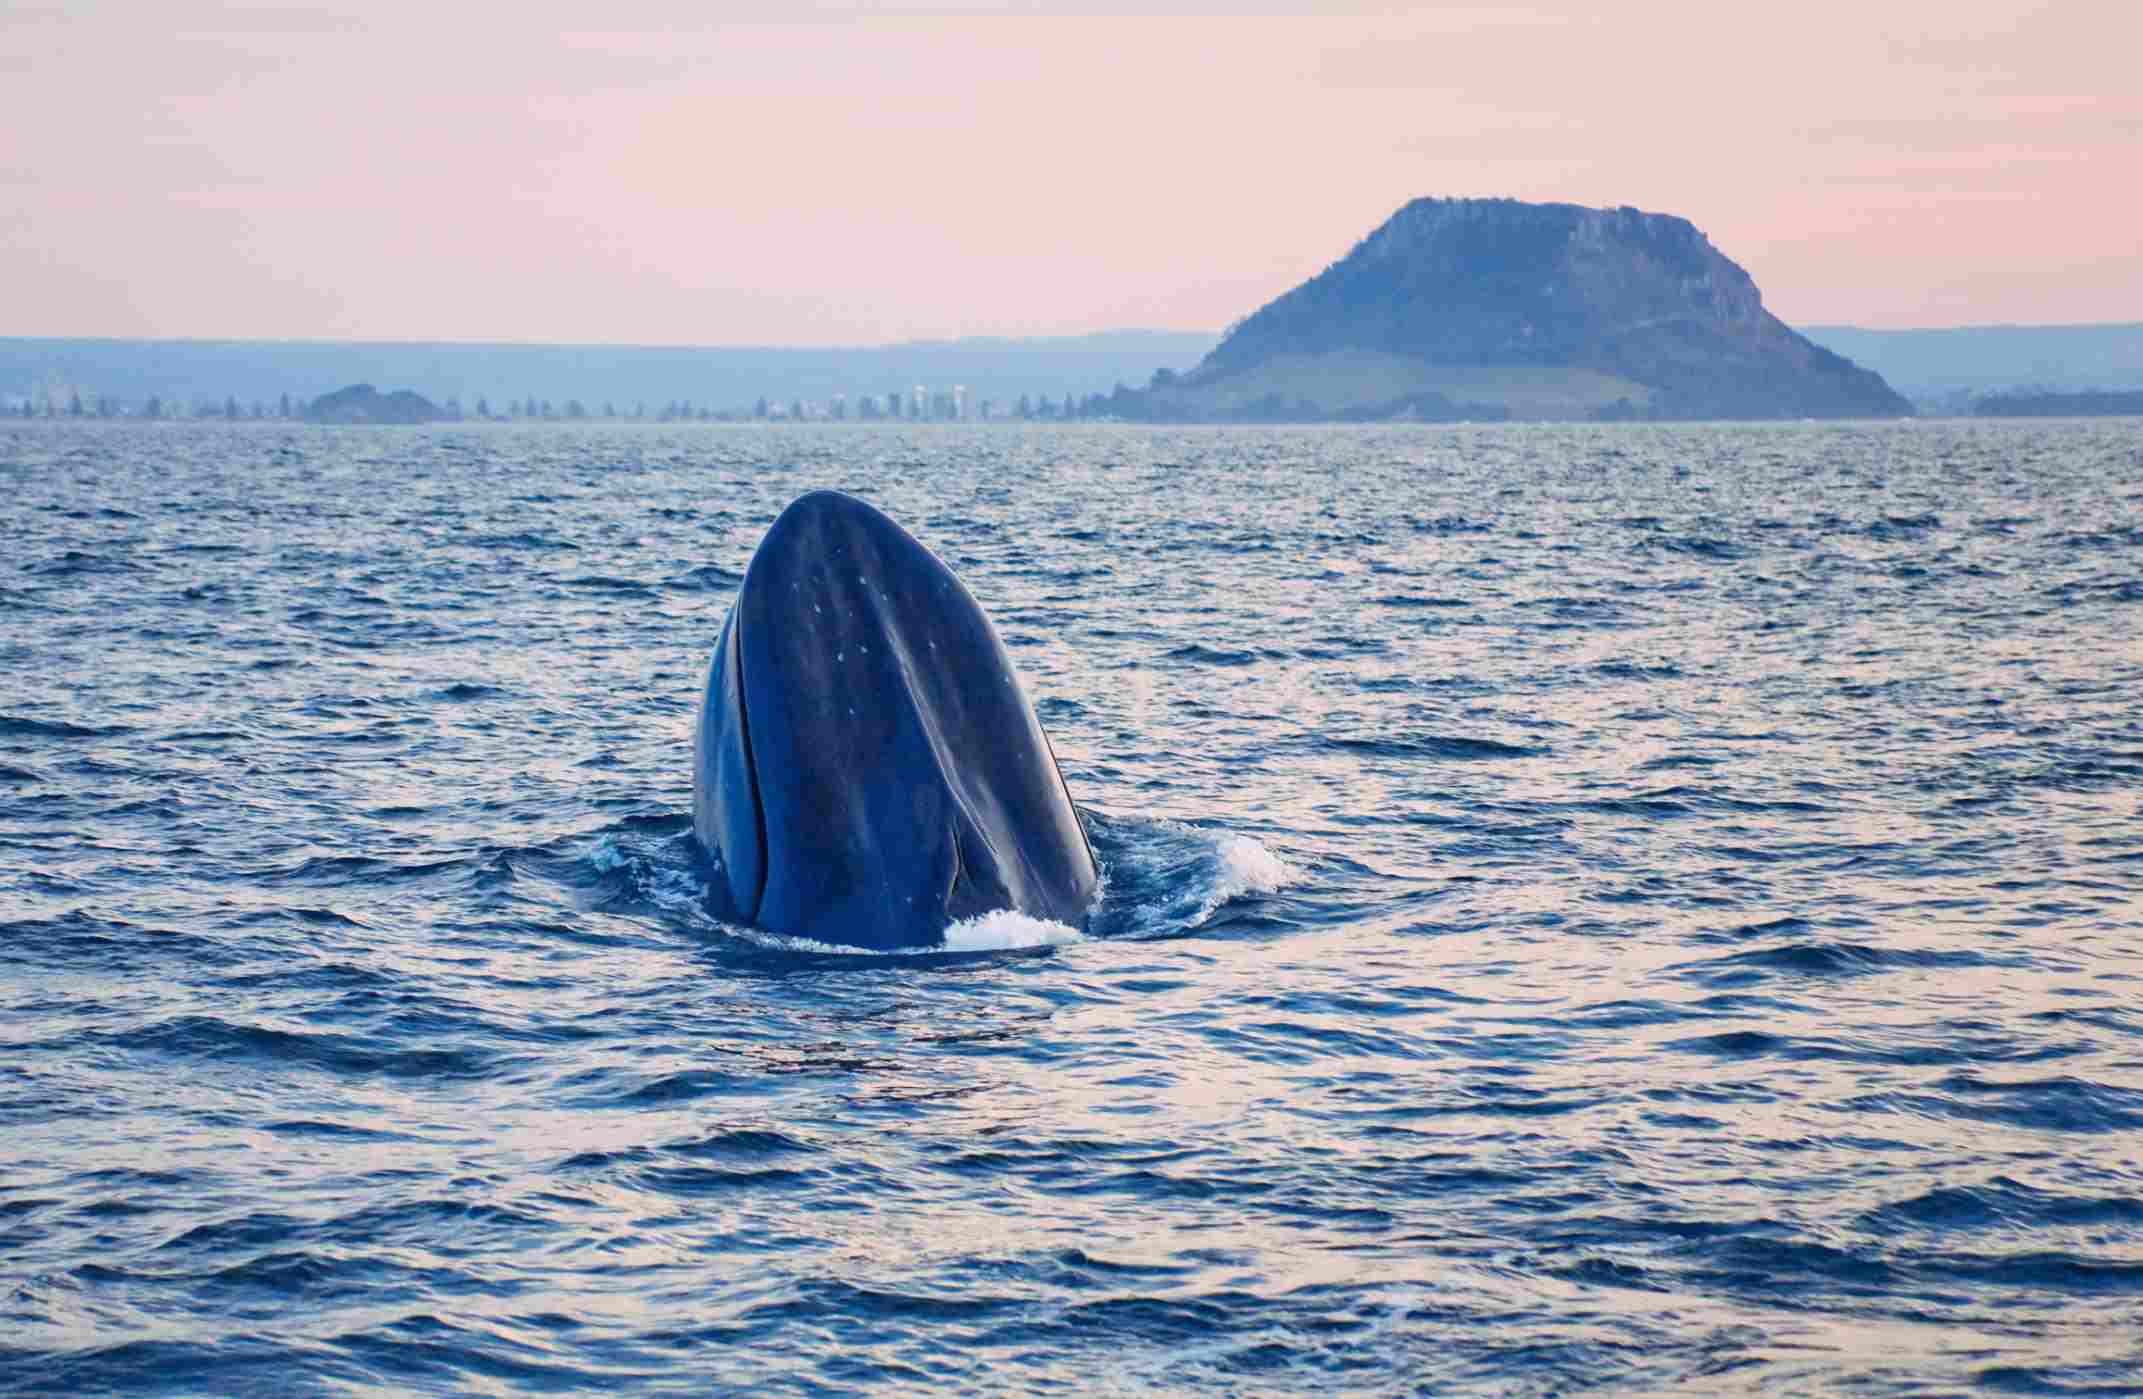 Blue Whale feeding near shore, New Zealand